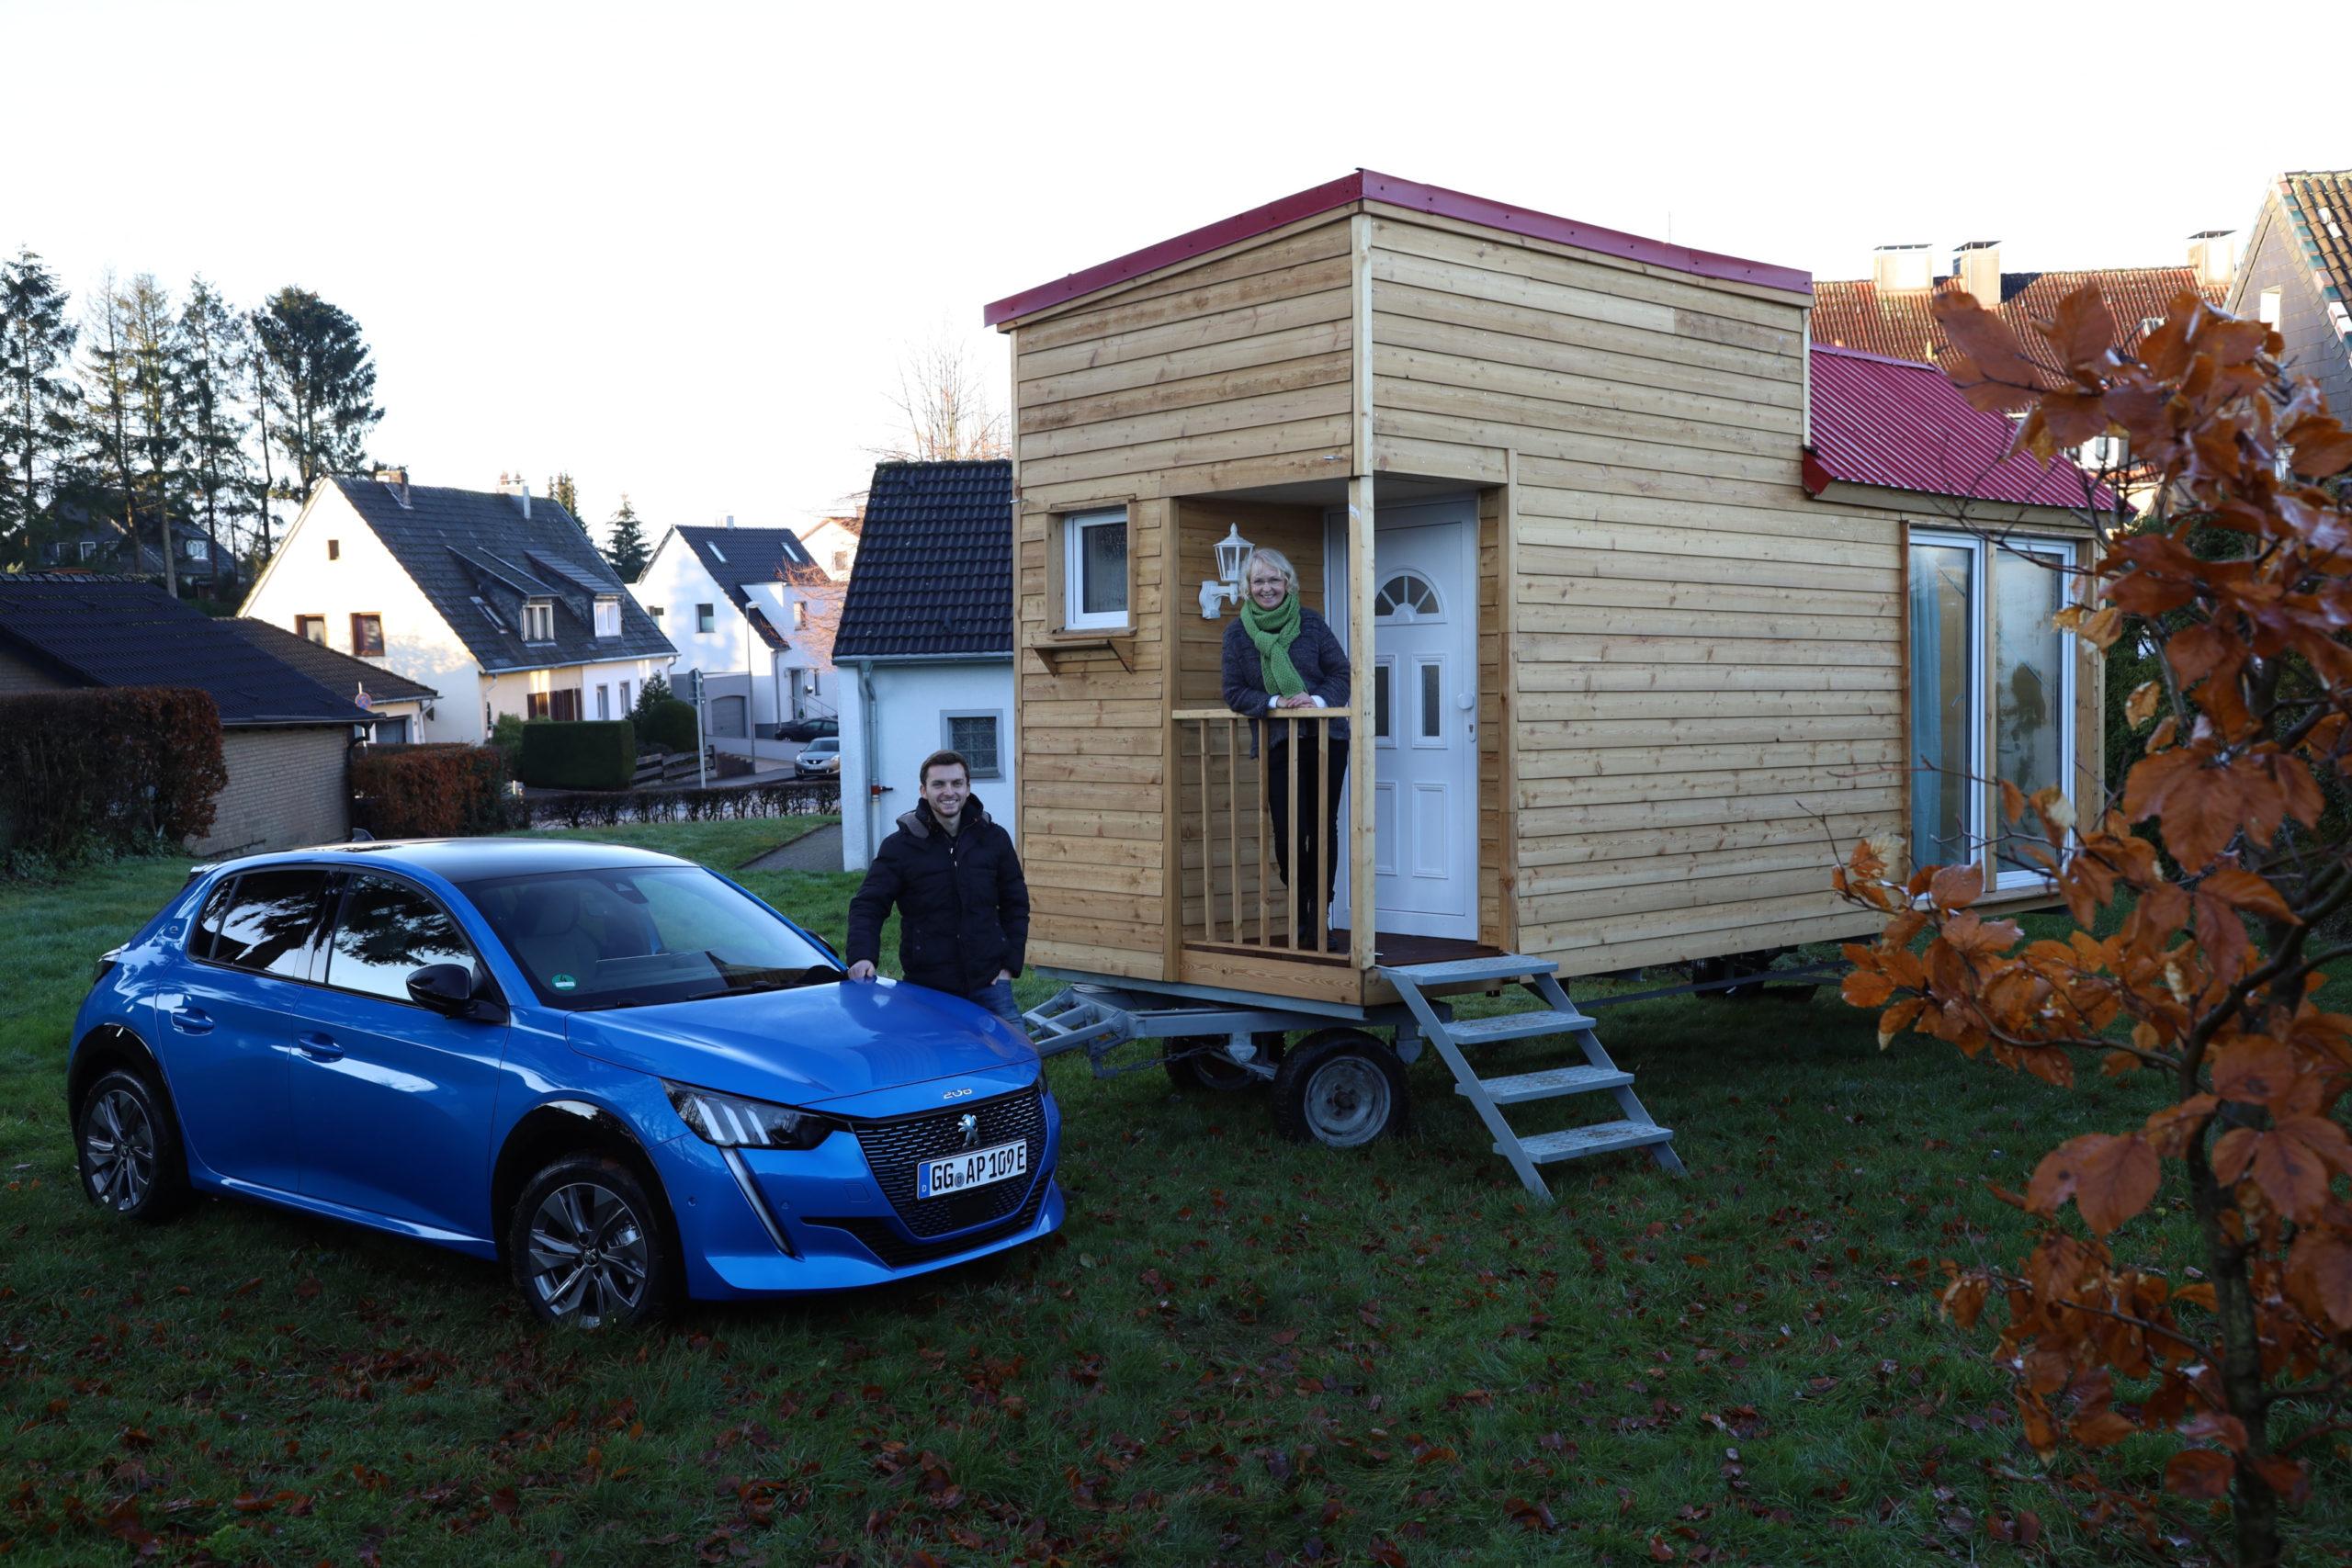 Peugeot Tiny House (Foto: Peugeot Kommunikation)